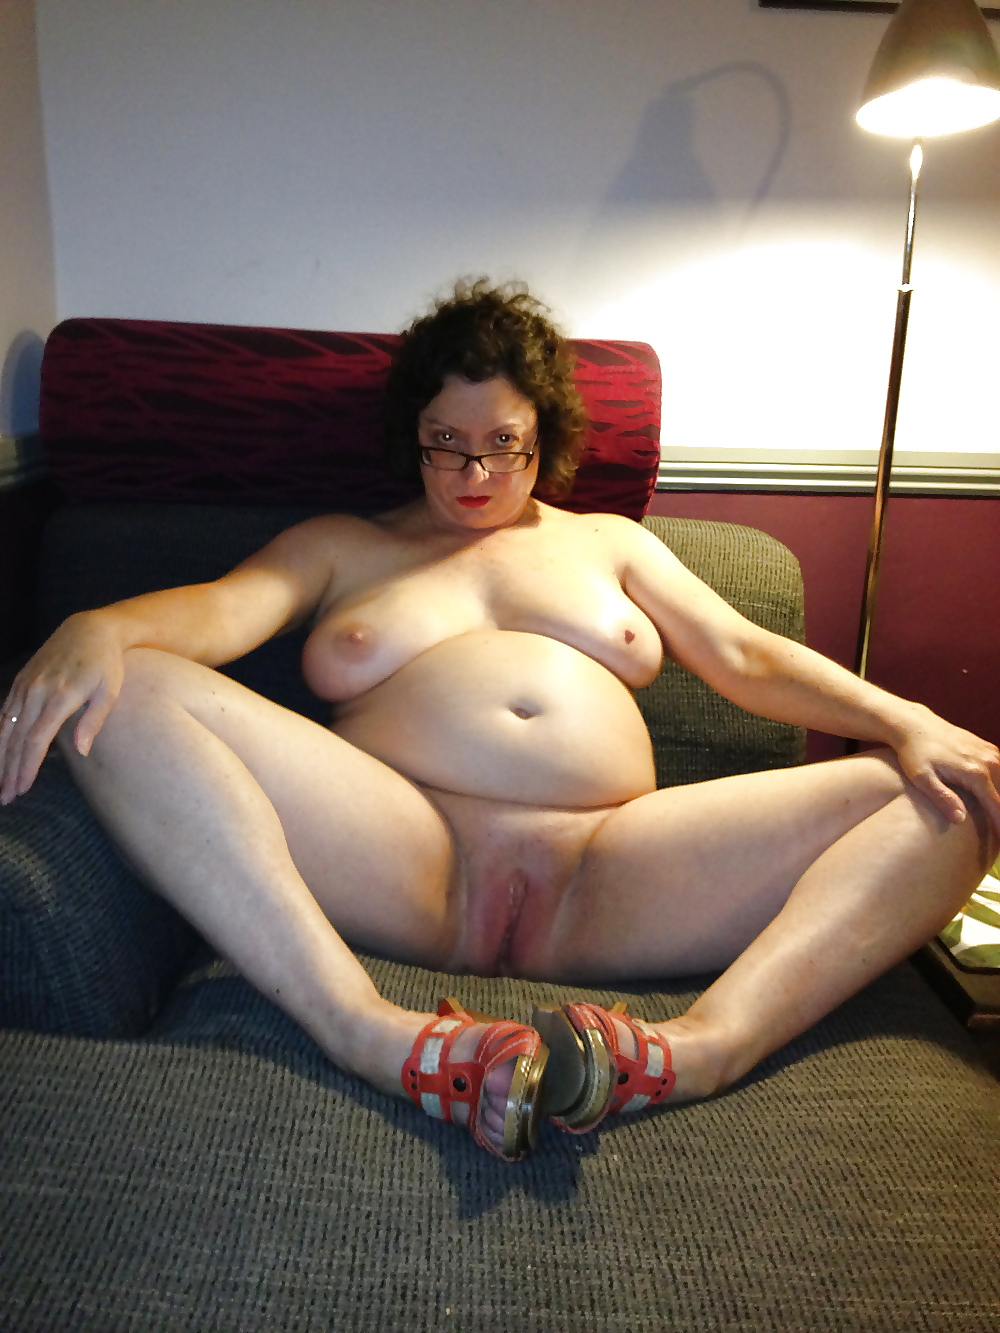 Chat kentucky lesbian room